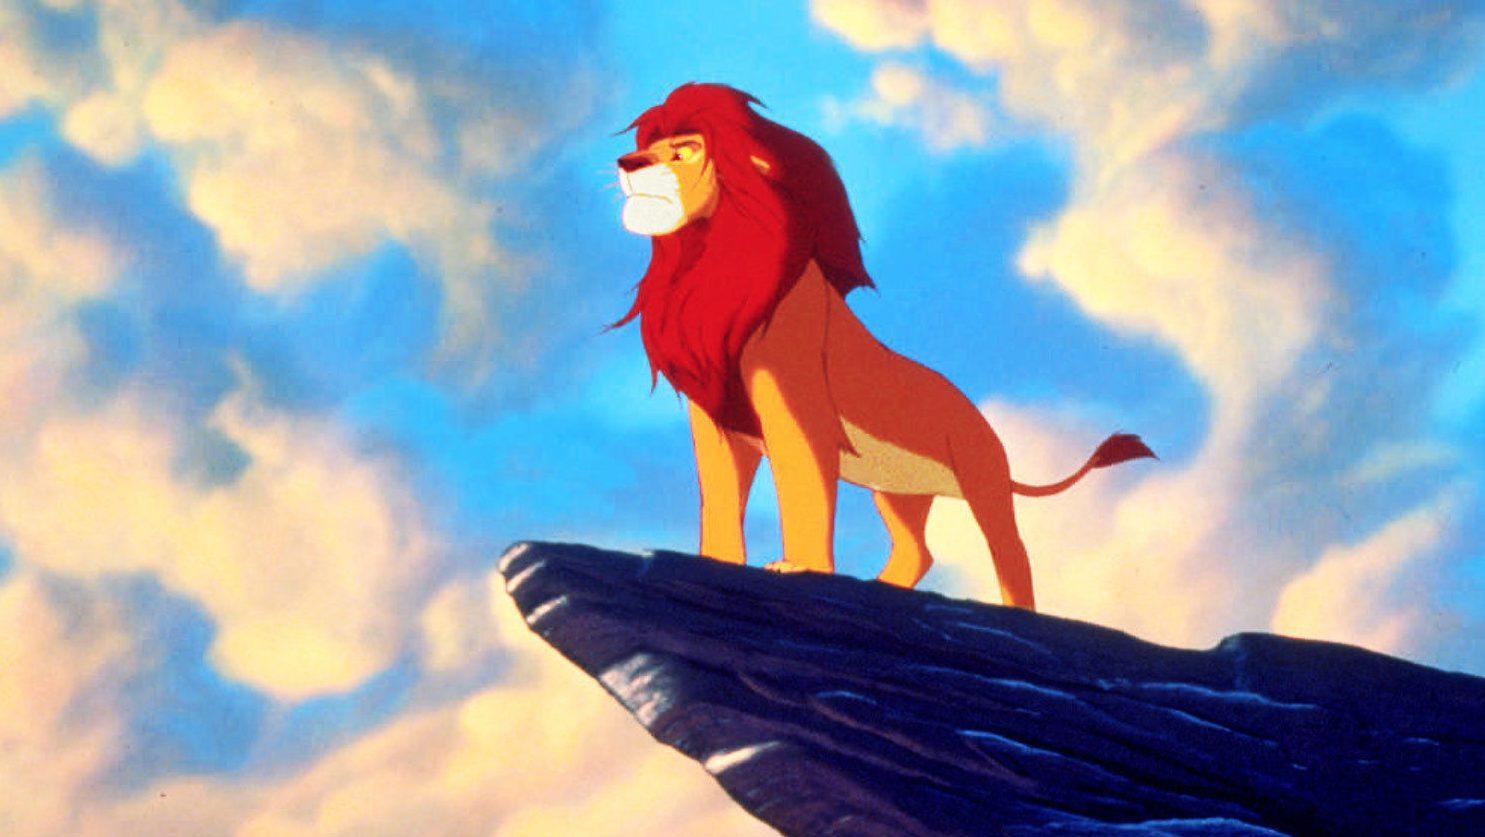 Disney Dis Is Remaking The Lion King With The Jungle Book Director Jon Favreau Quartz